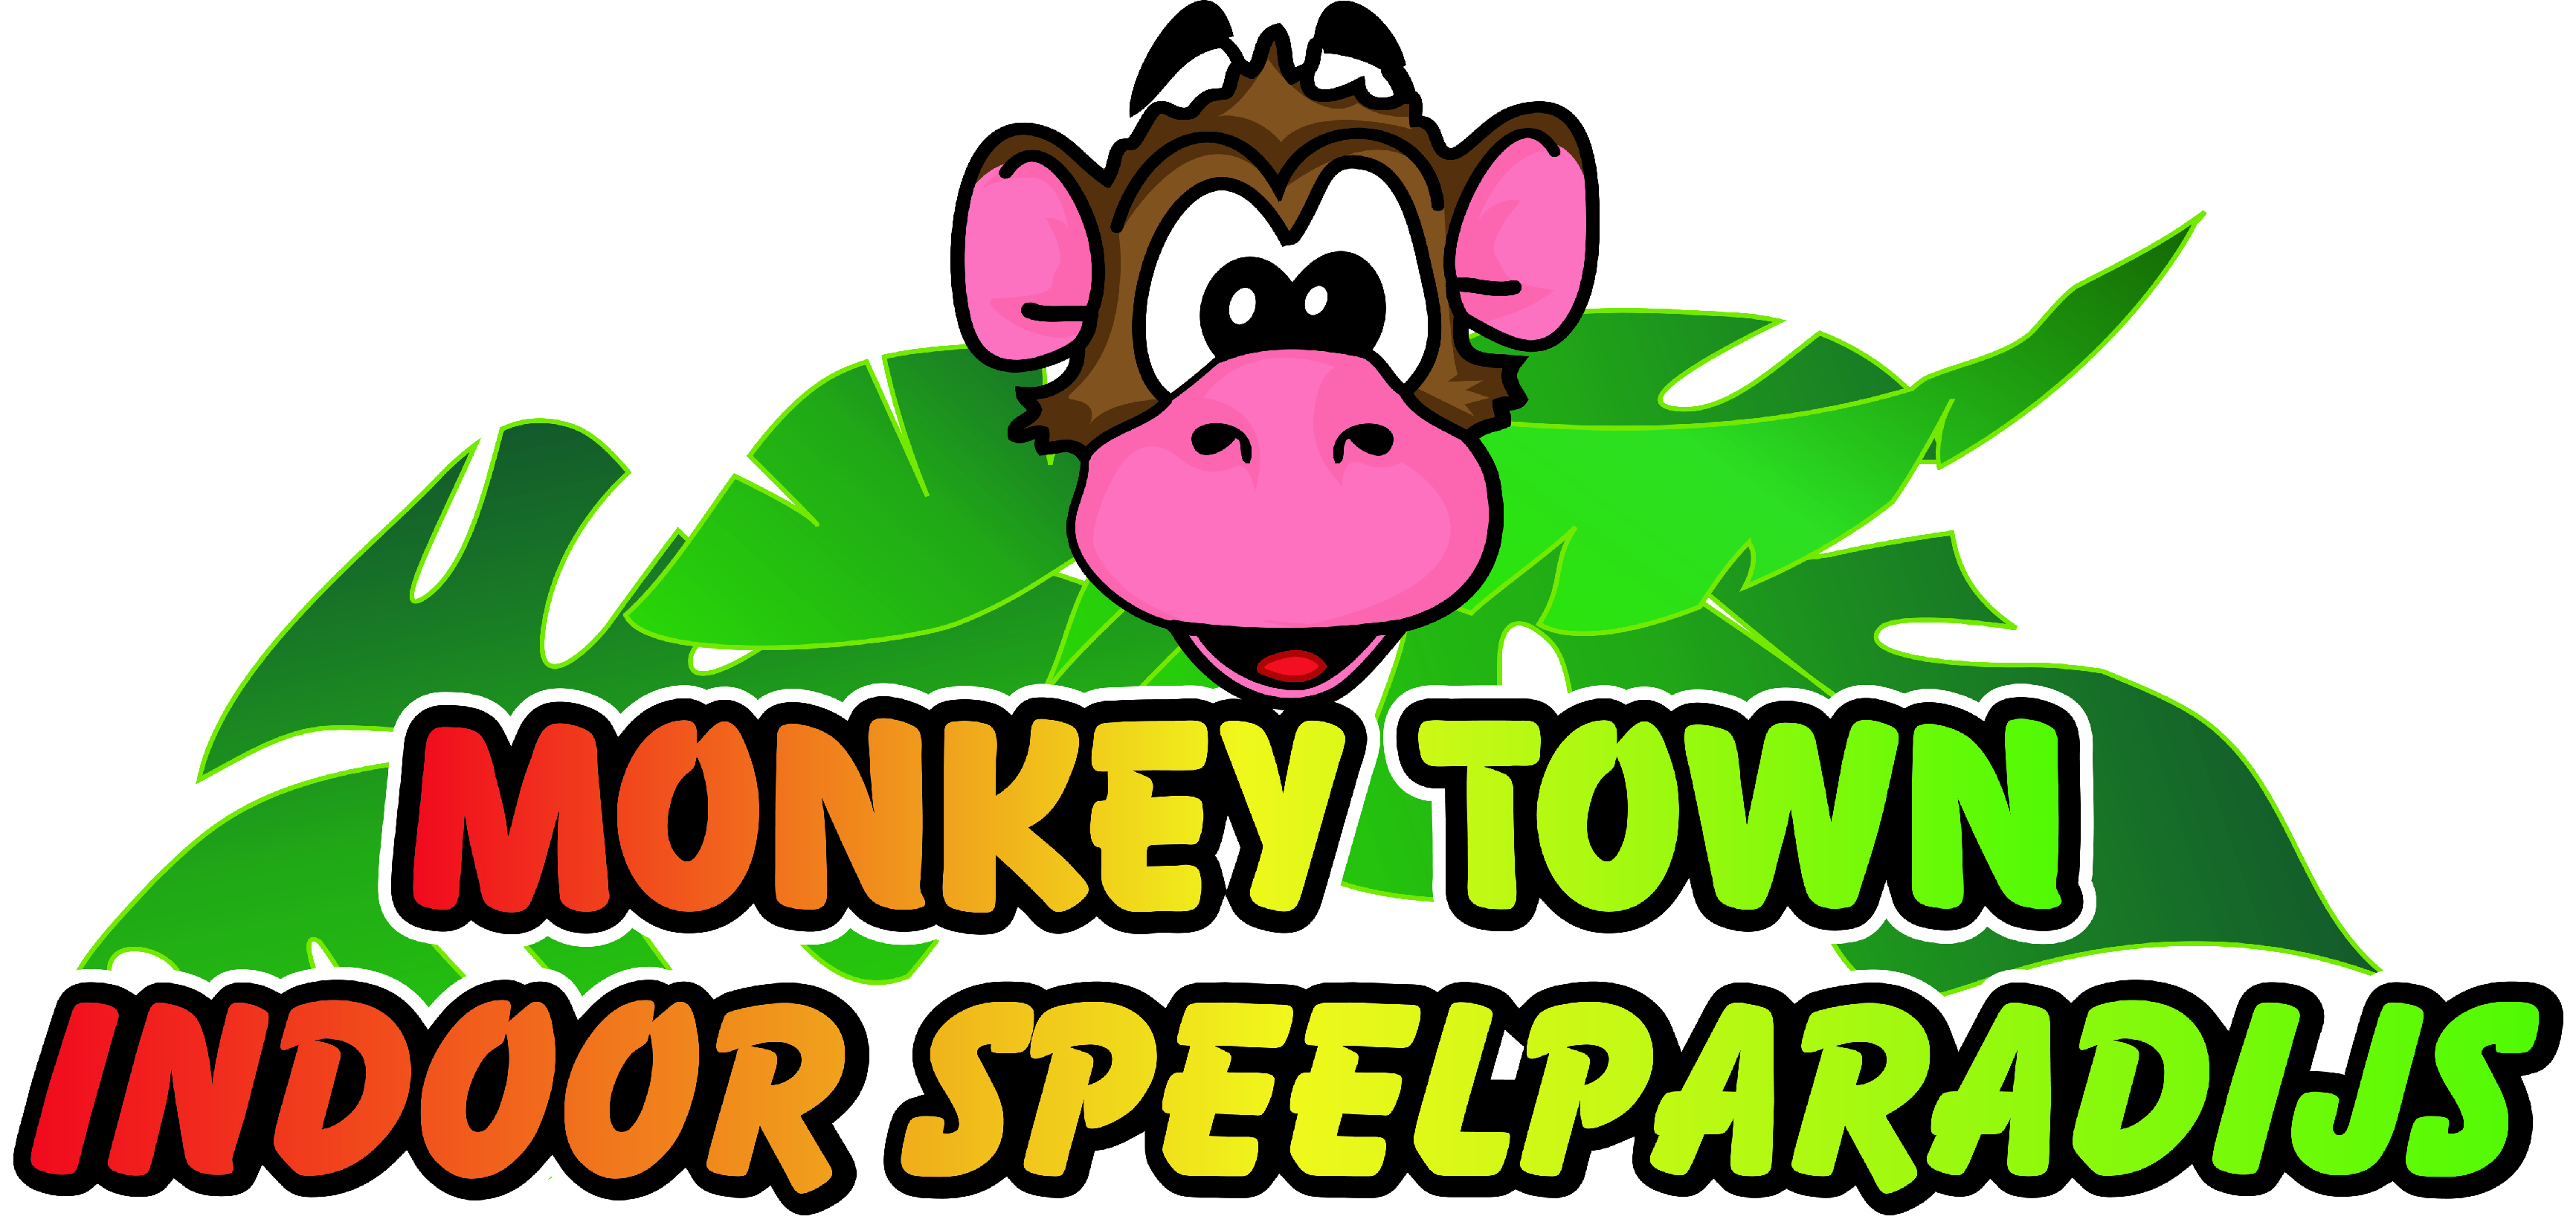 Monkey Town Enschede